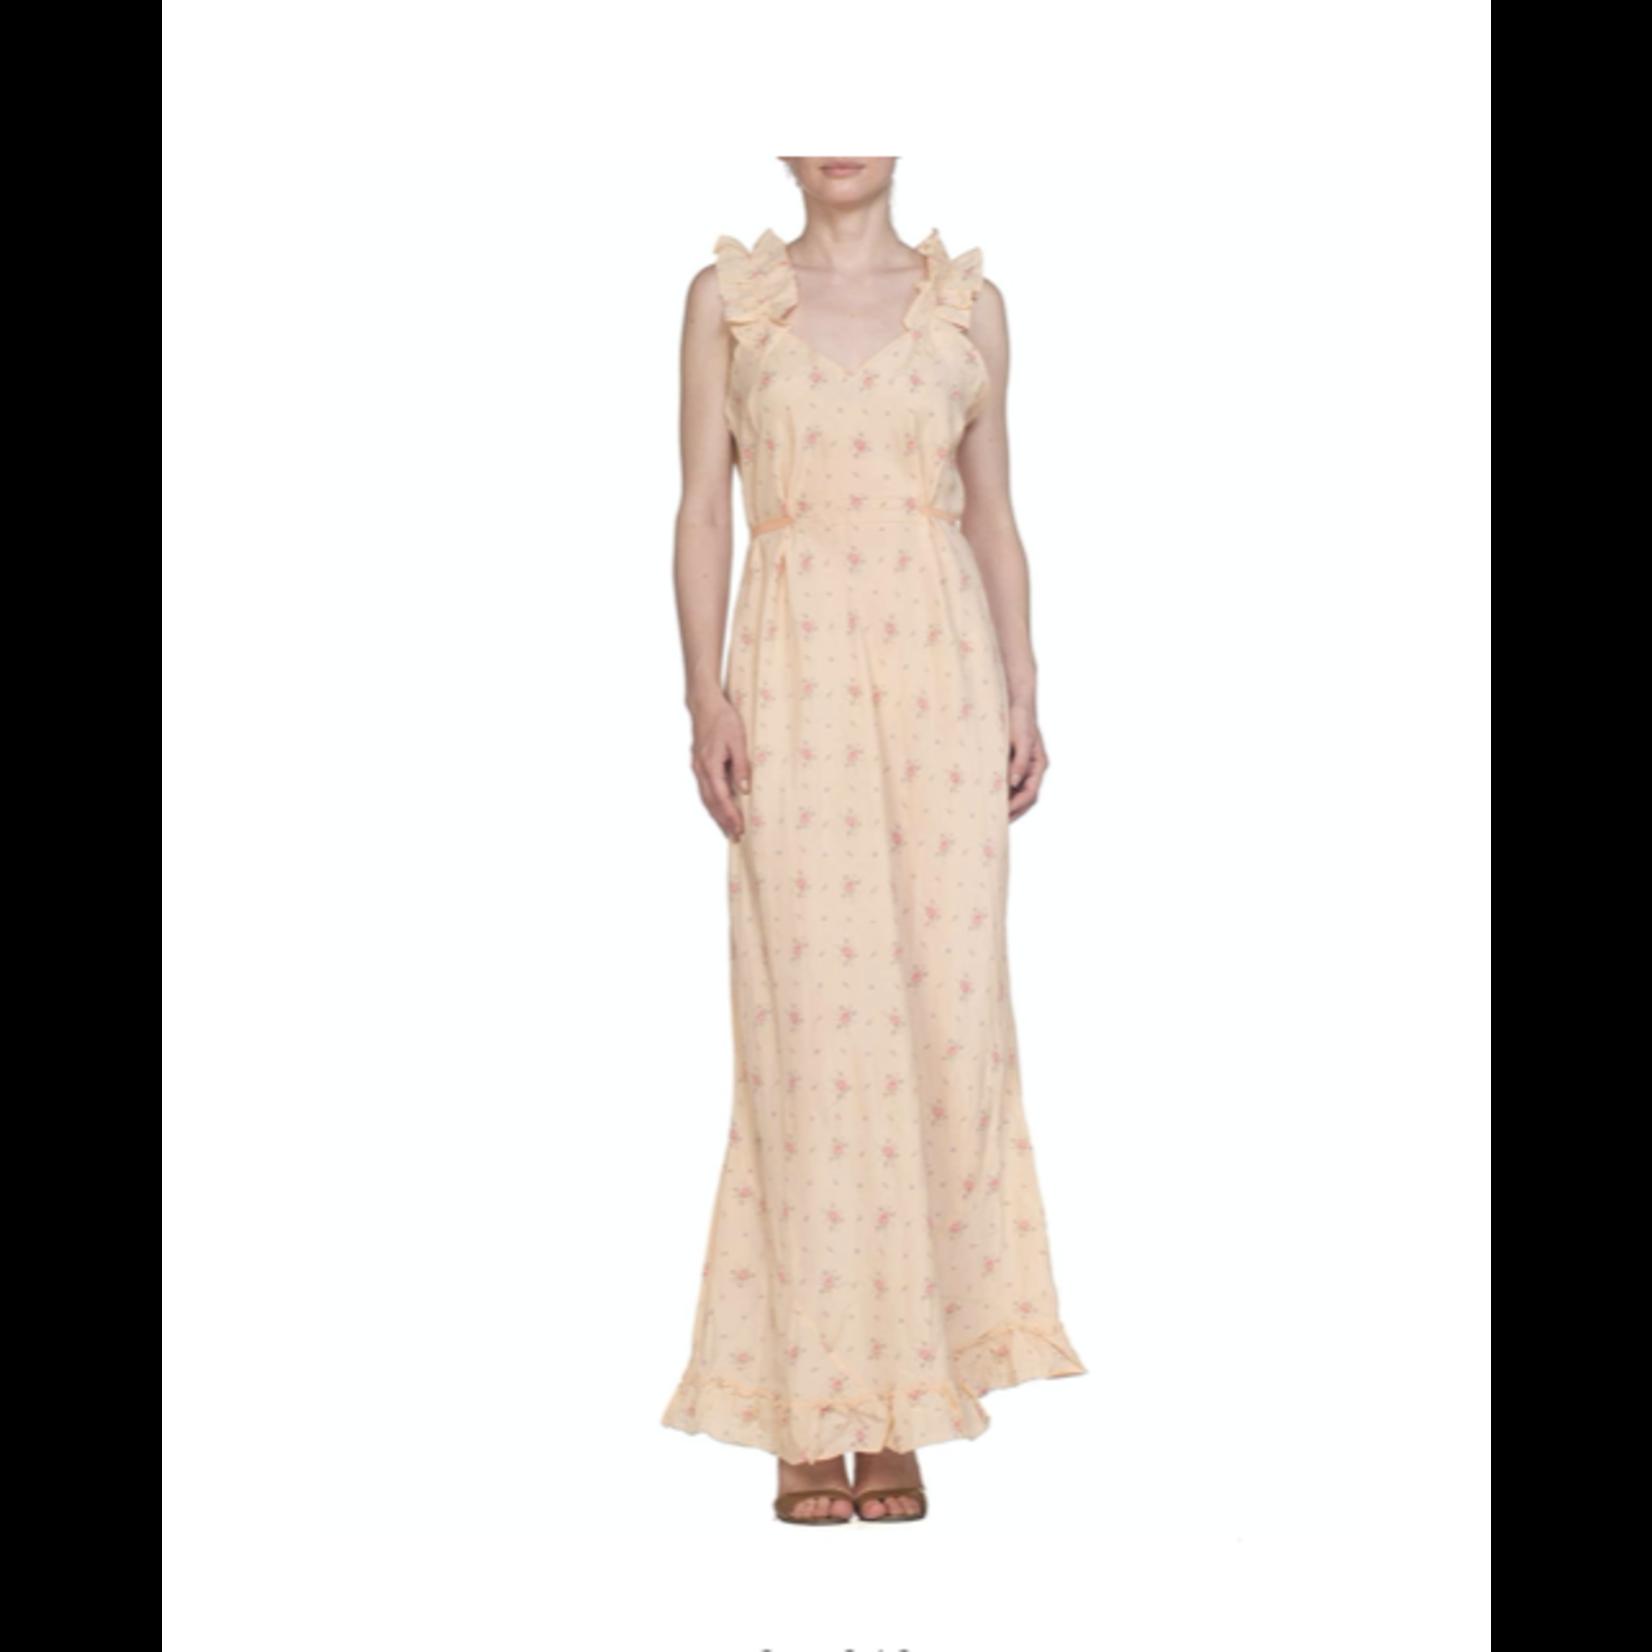 1940s Peach Bias Cut Silk Floral  Slip Dress with Low Ruffle Back & Waist Ties SL6ON0627